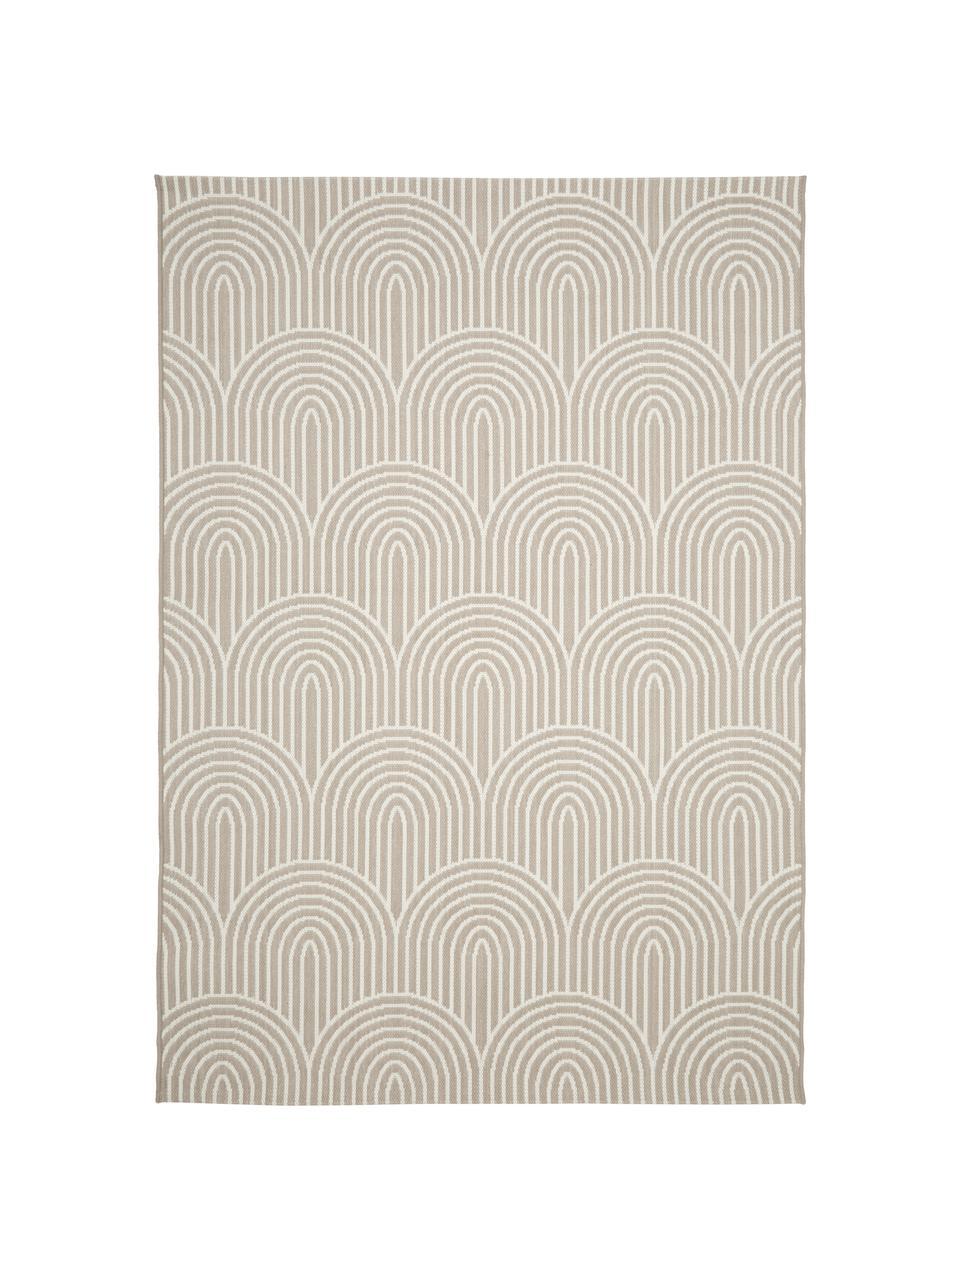 In- & outdoor vloerkleed Arches in beige/crèmewit, 86% polypropyleen, 14% polyester, Beige, wit, B 200 x L 290 cm (maat L)